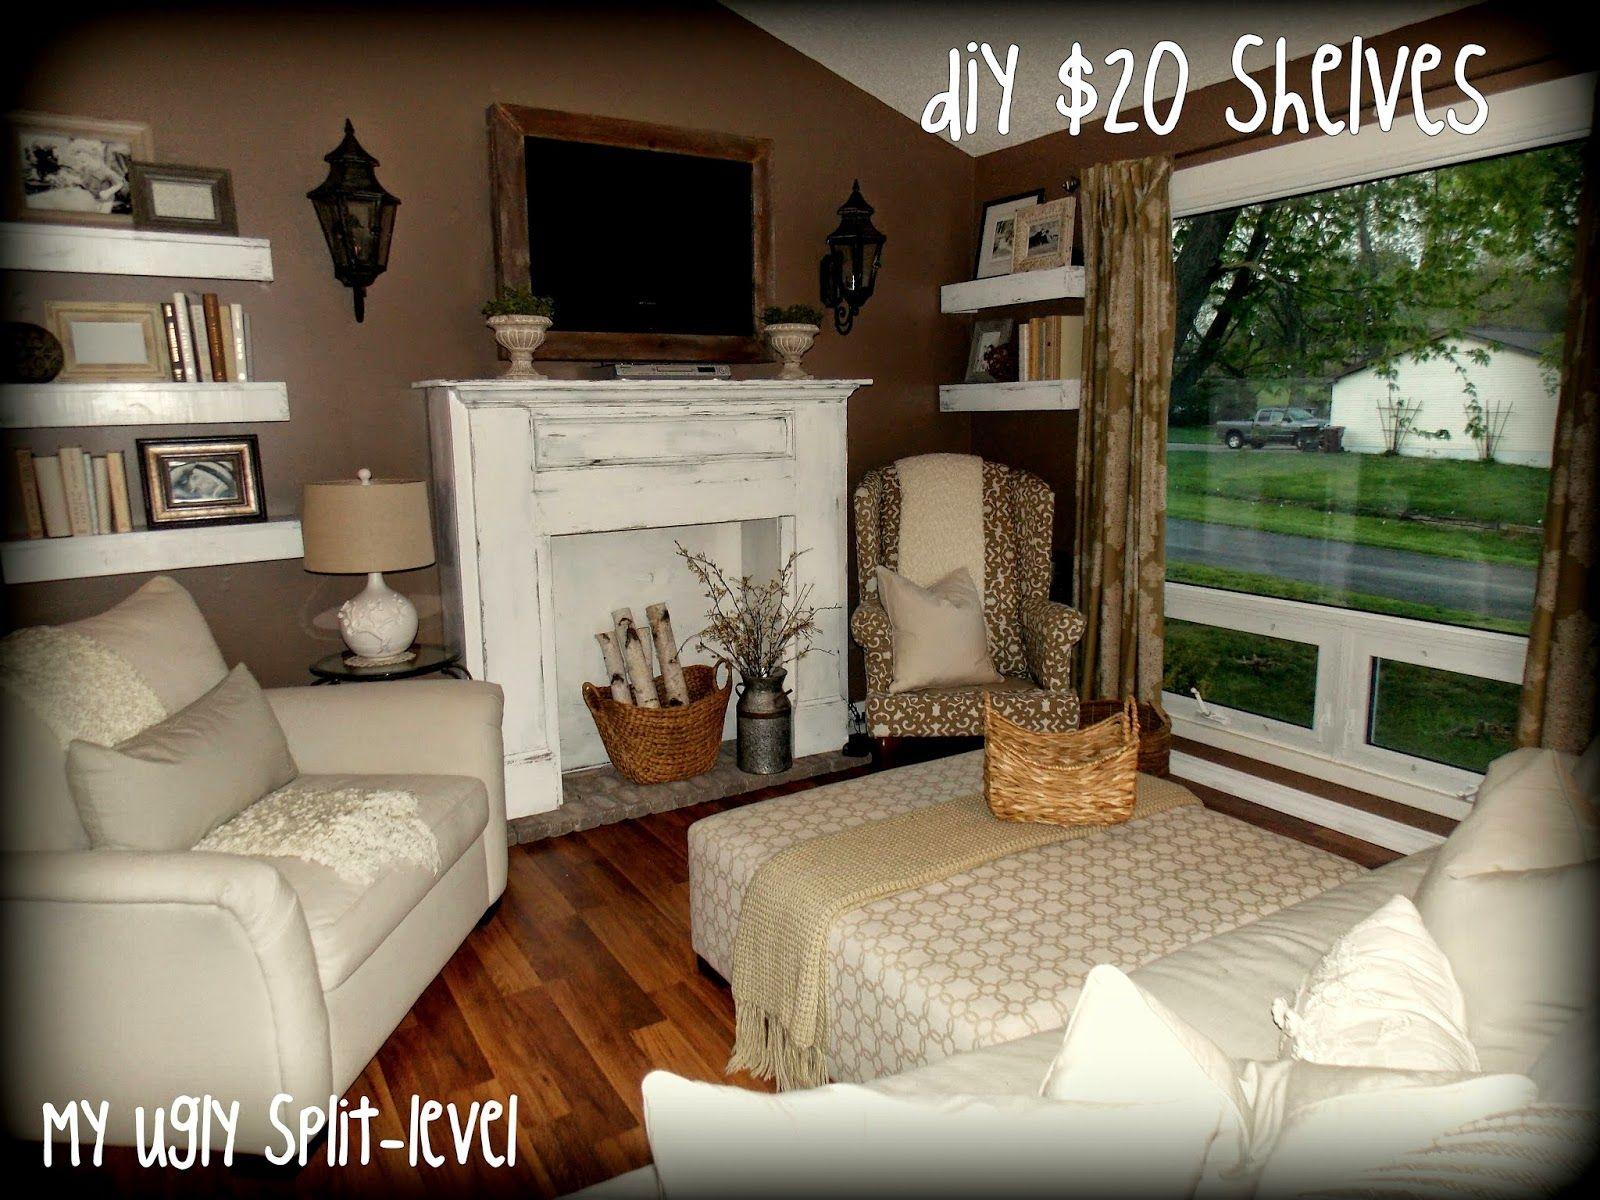 My Ugly Splitlevelfurniture Layout  For The Home  Pinterest Classy Furniture Arrangement Living Room Decorating Inspiration